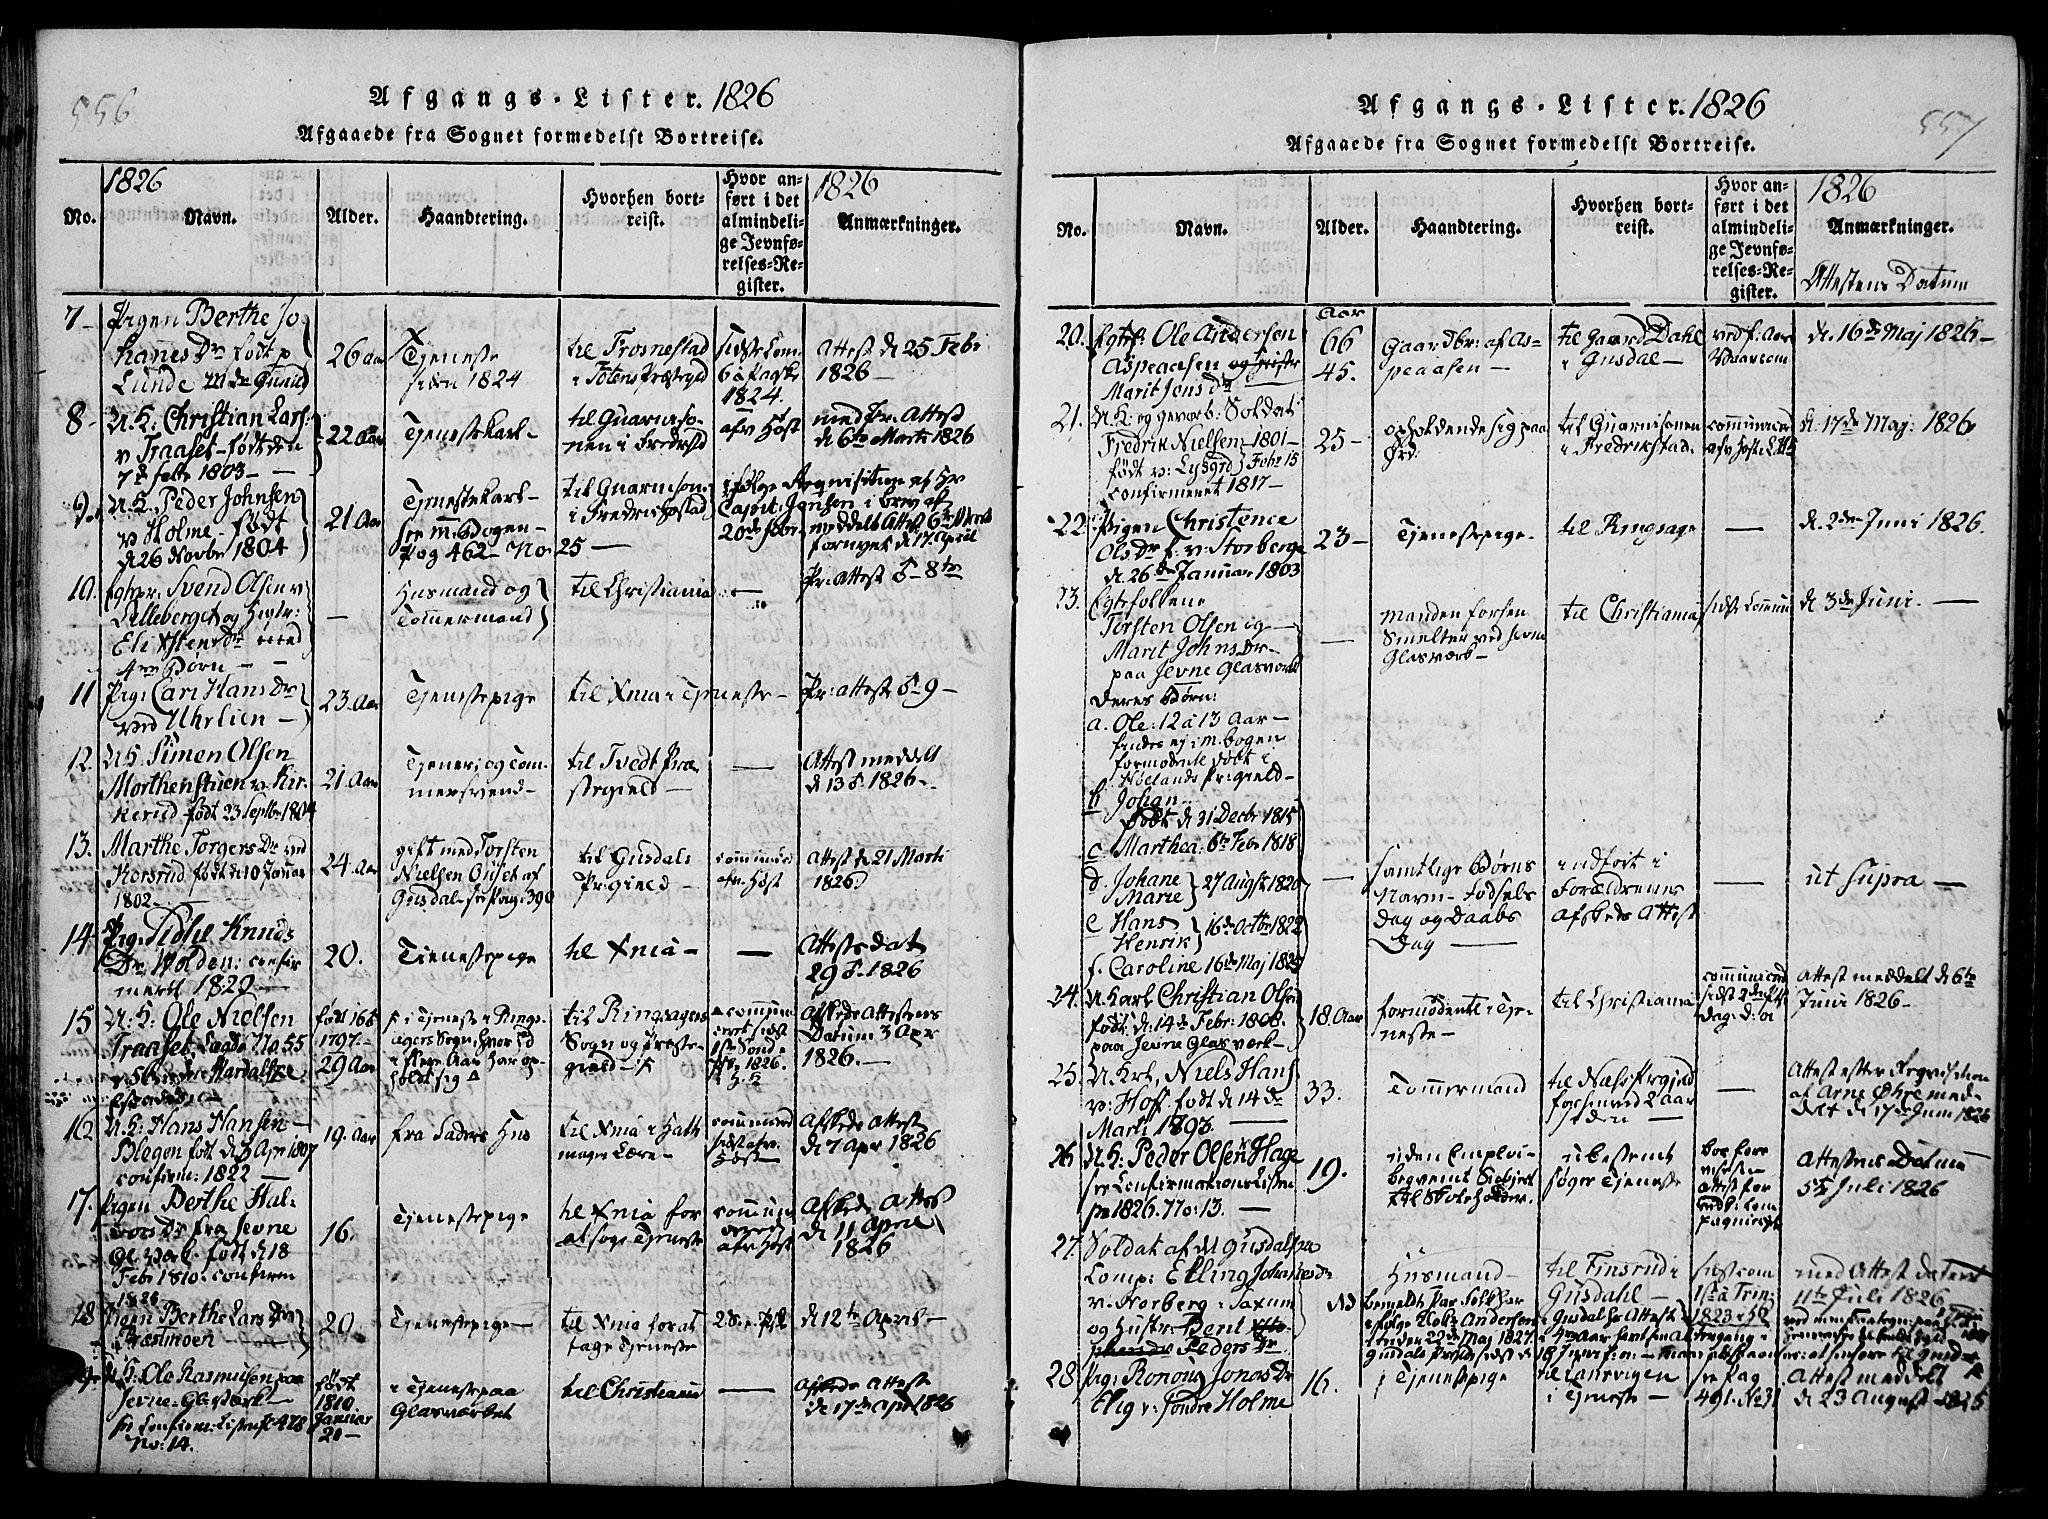 SAH, Fåberg prestekontor, Ministerialbok nr. 3, 1818-1833, s. 556-557